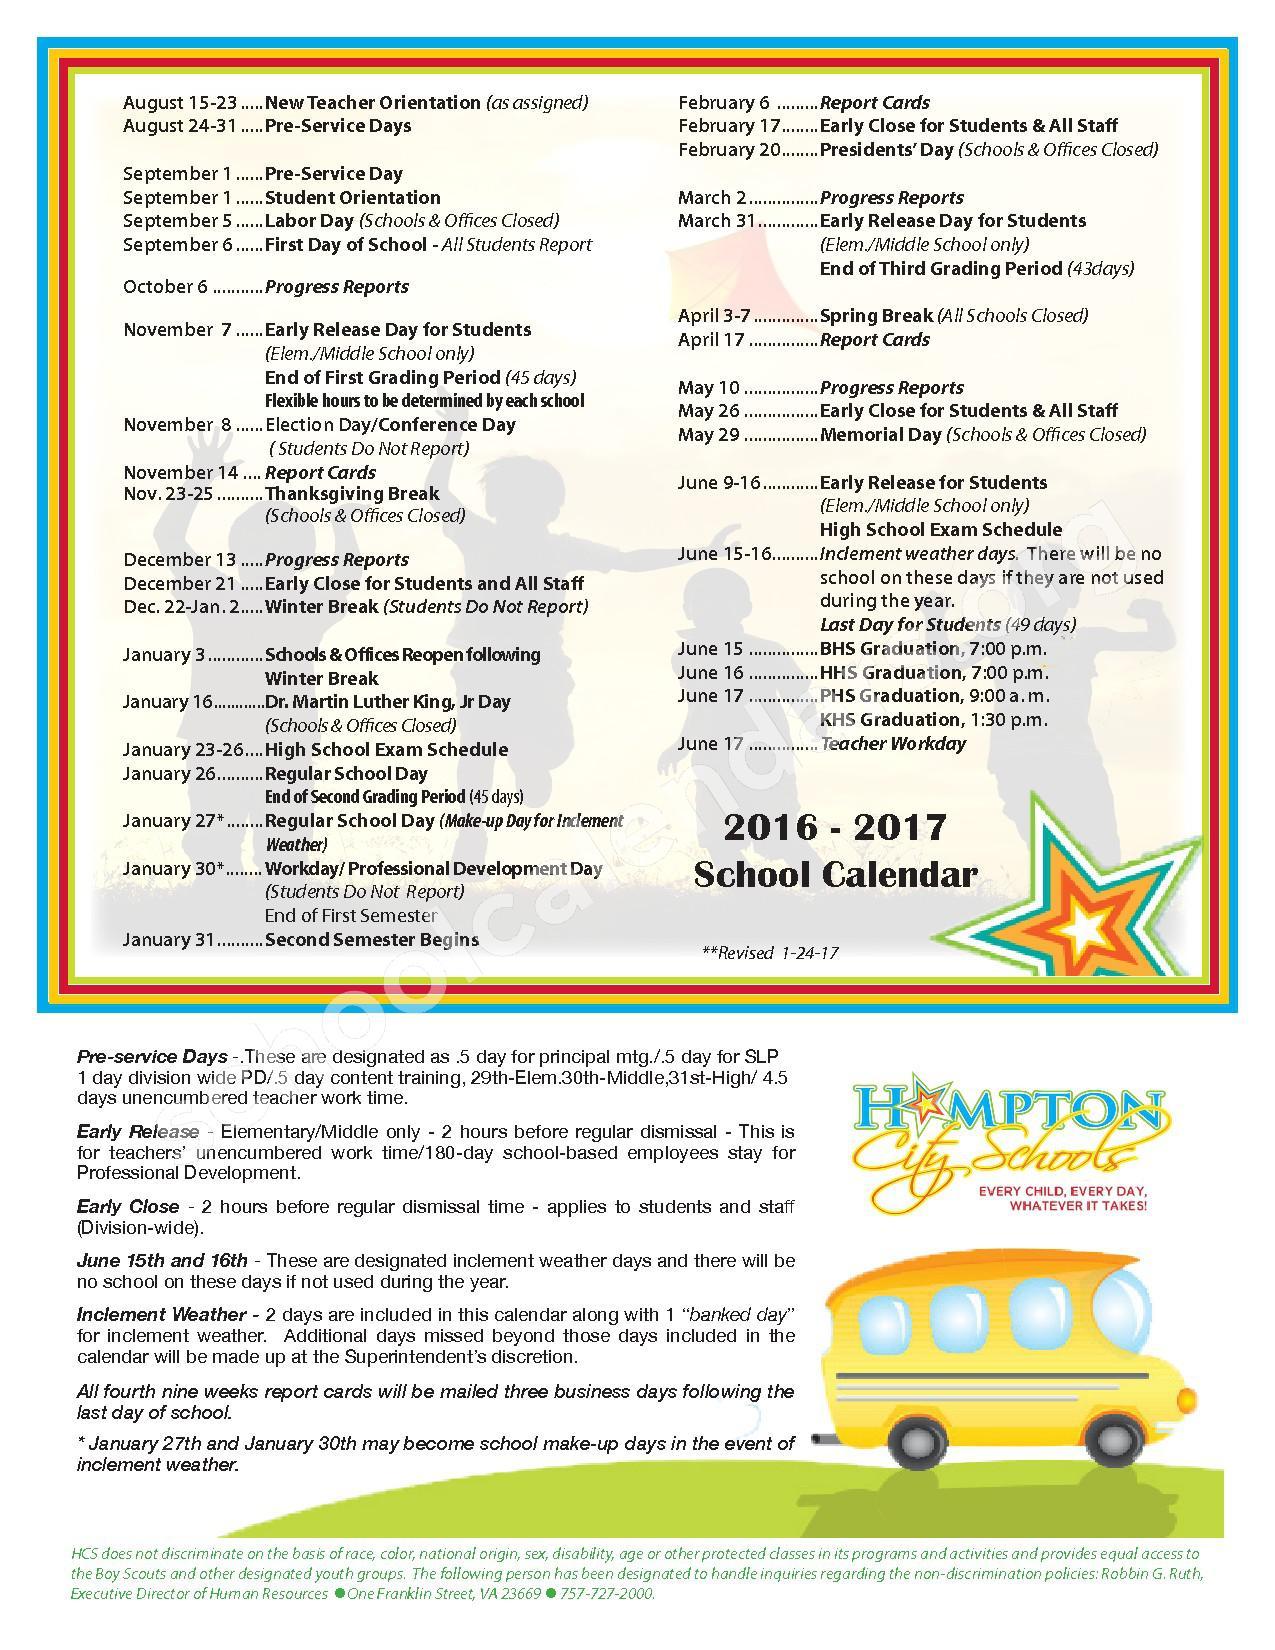 2016 - 2017 District Calendar – Hampton Public Schools – page 1